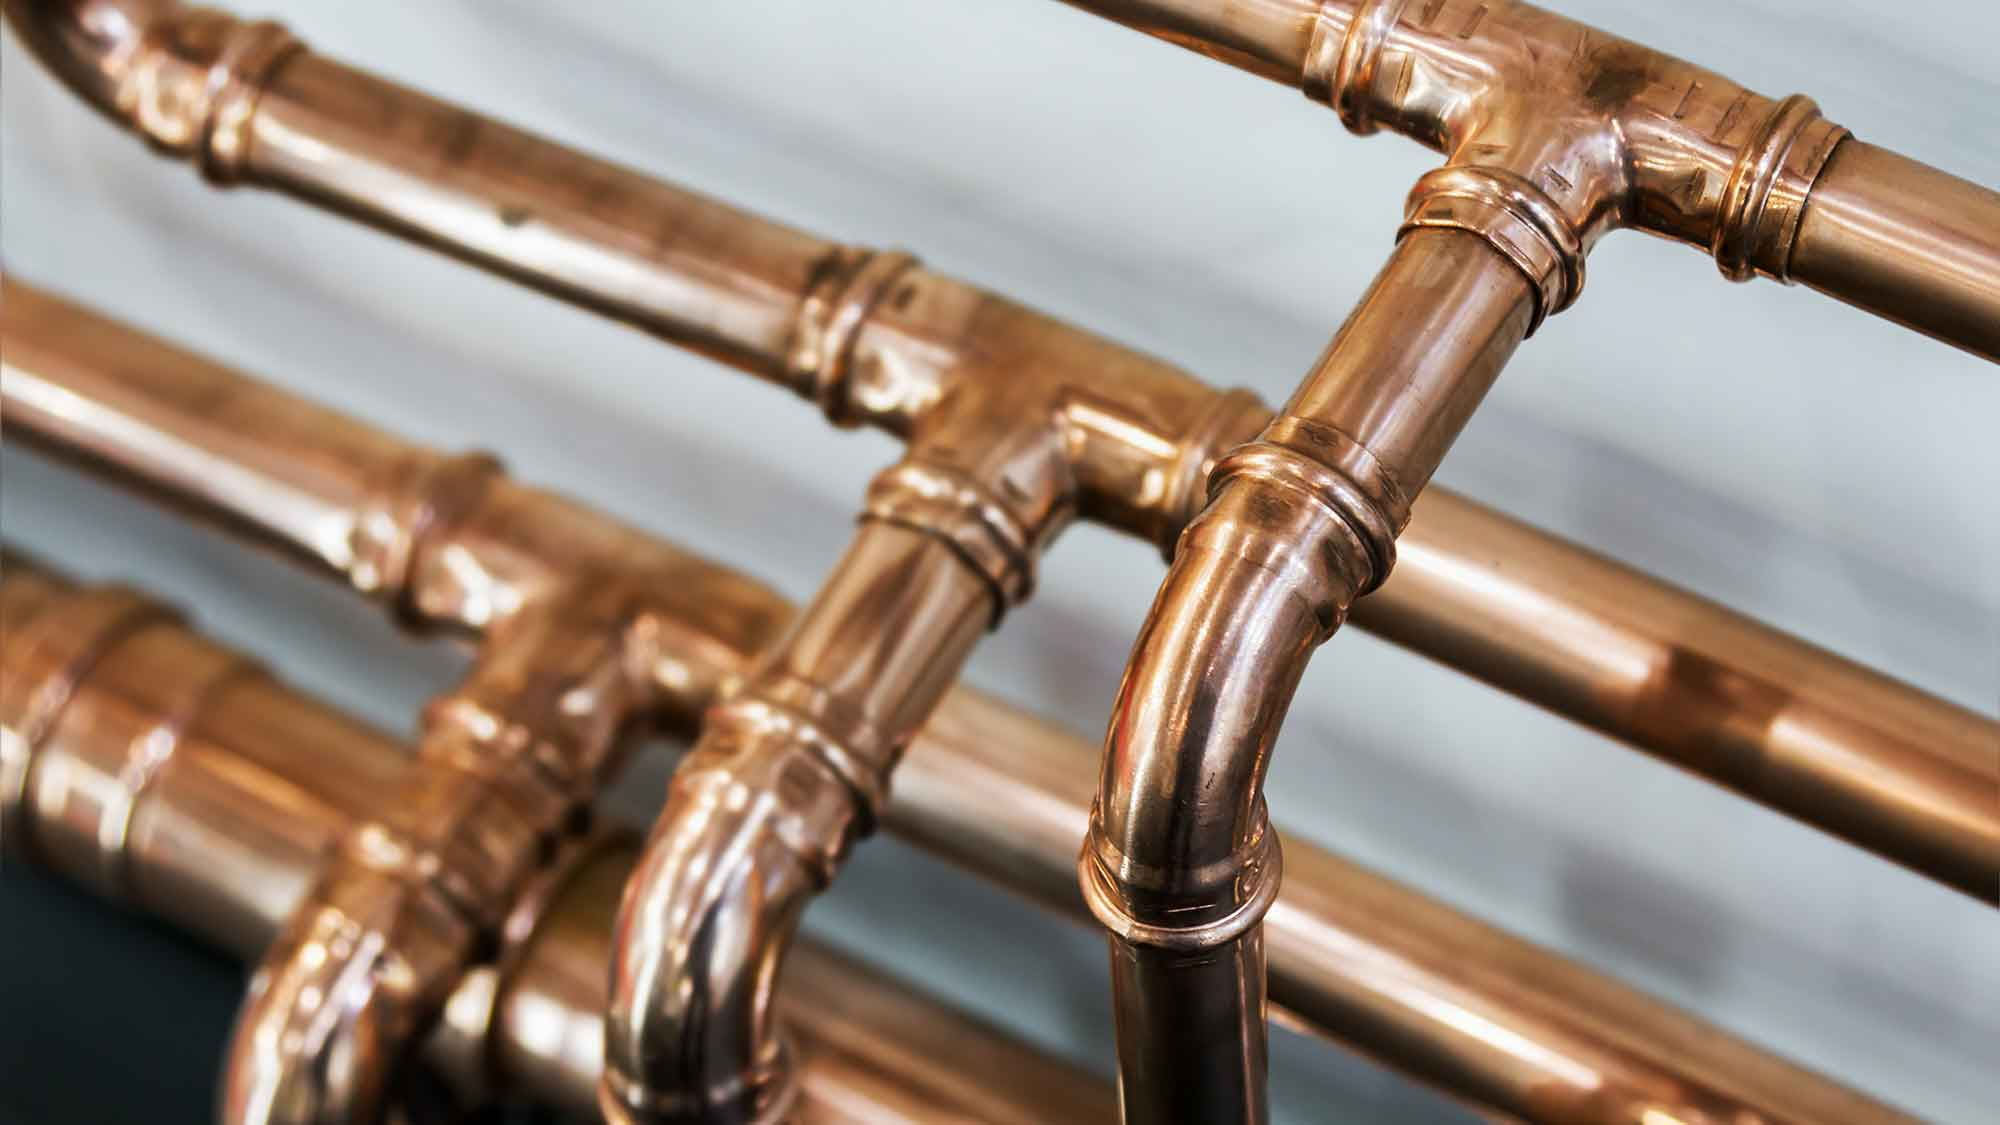 burst pipe repair essex maintenance leigh on sea new